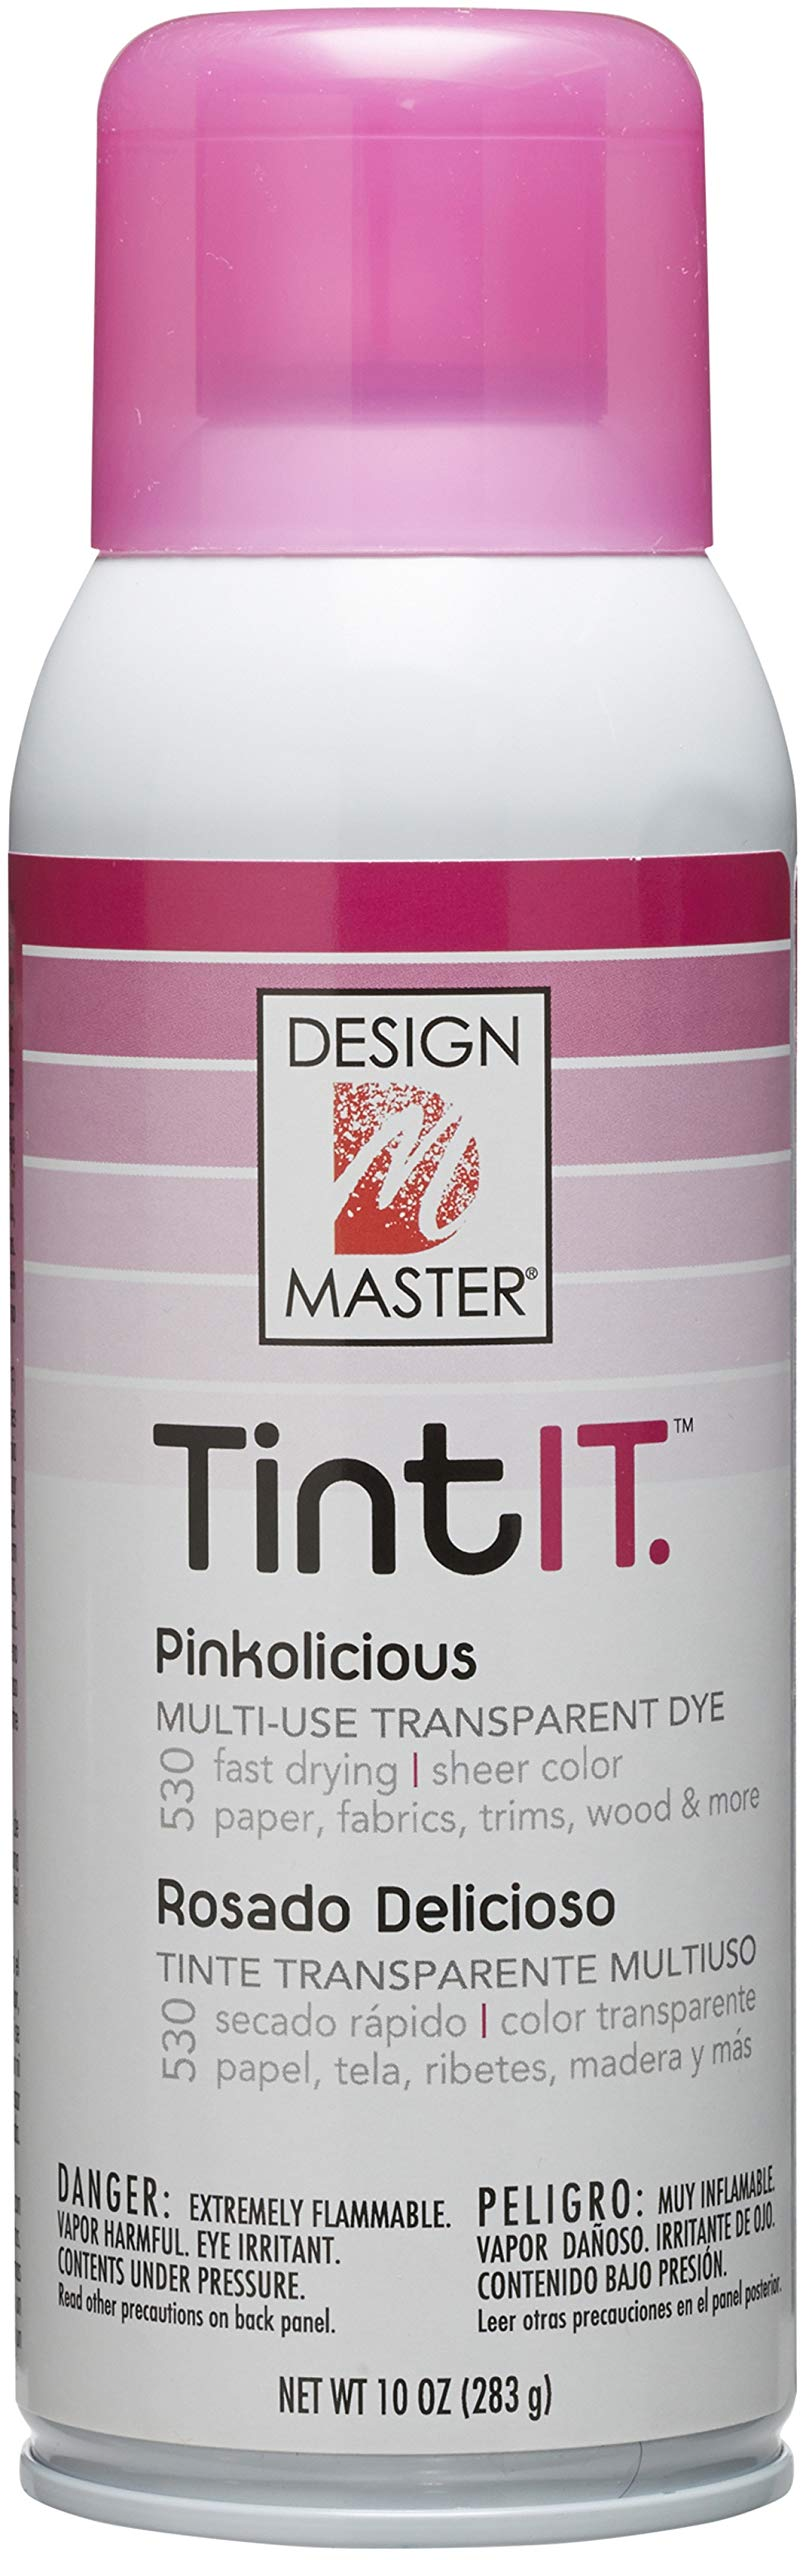 Design Master Tint IT Transparent Dye Spray Paint, 10-Ounce, Pinkolicious